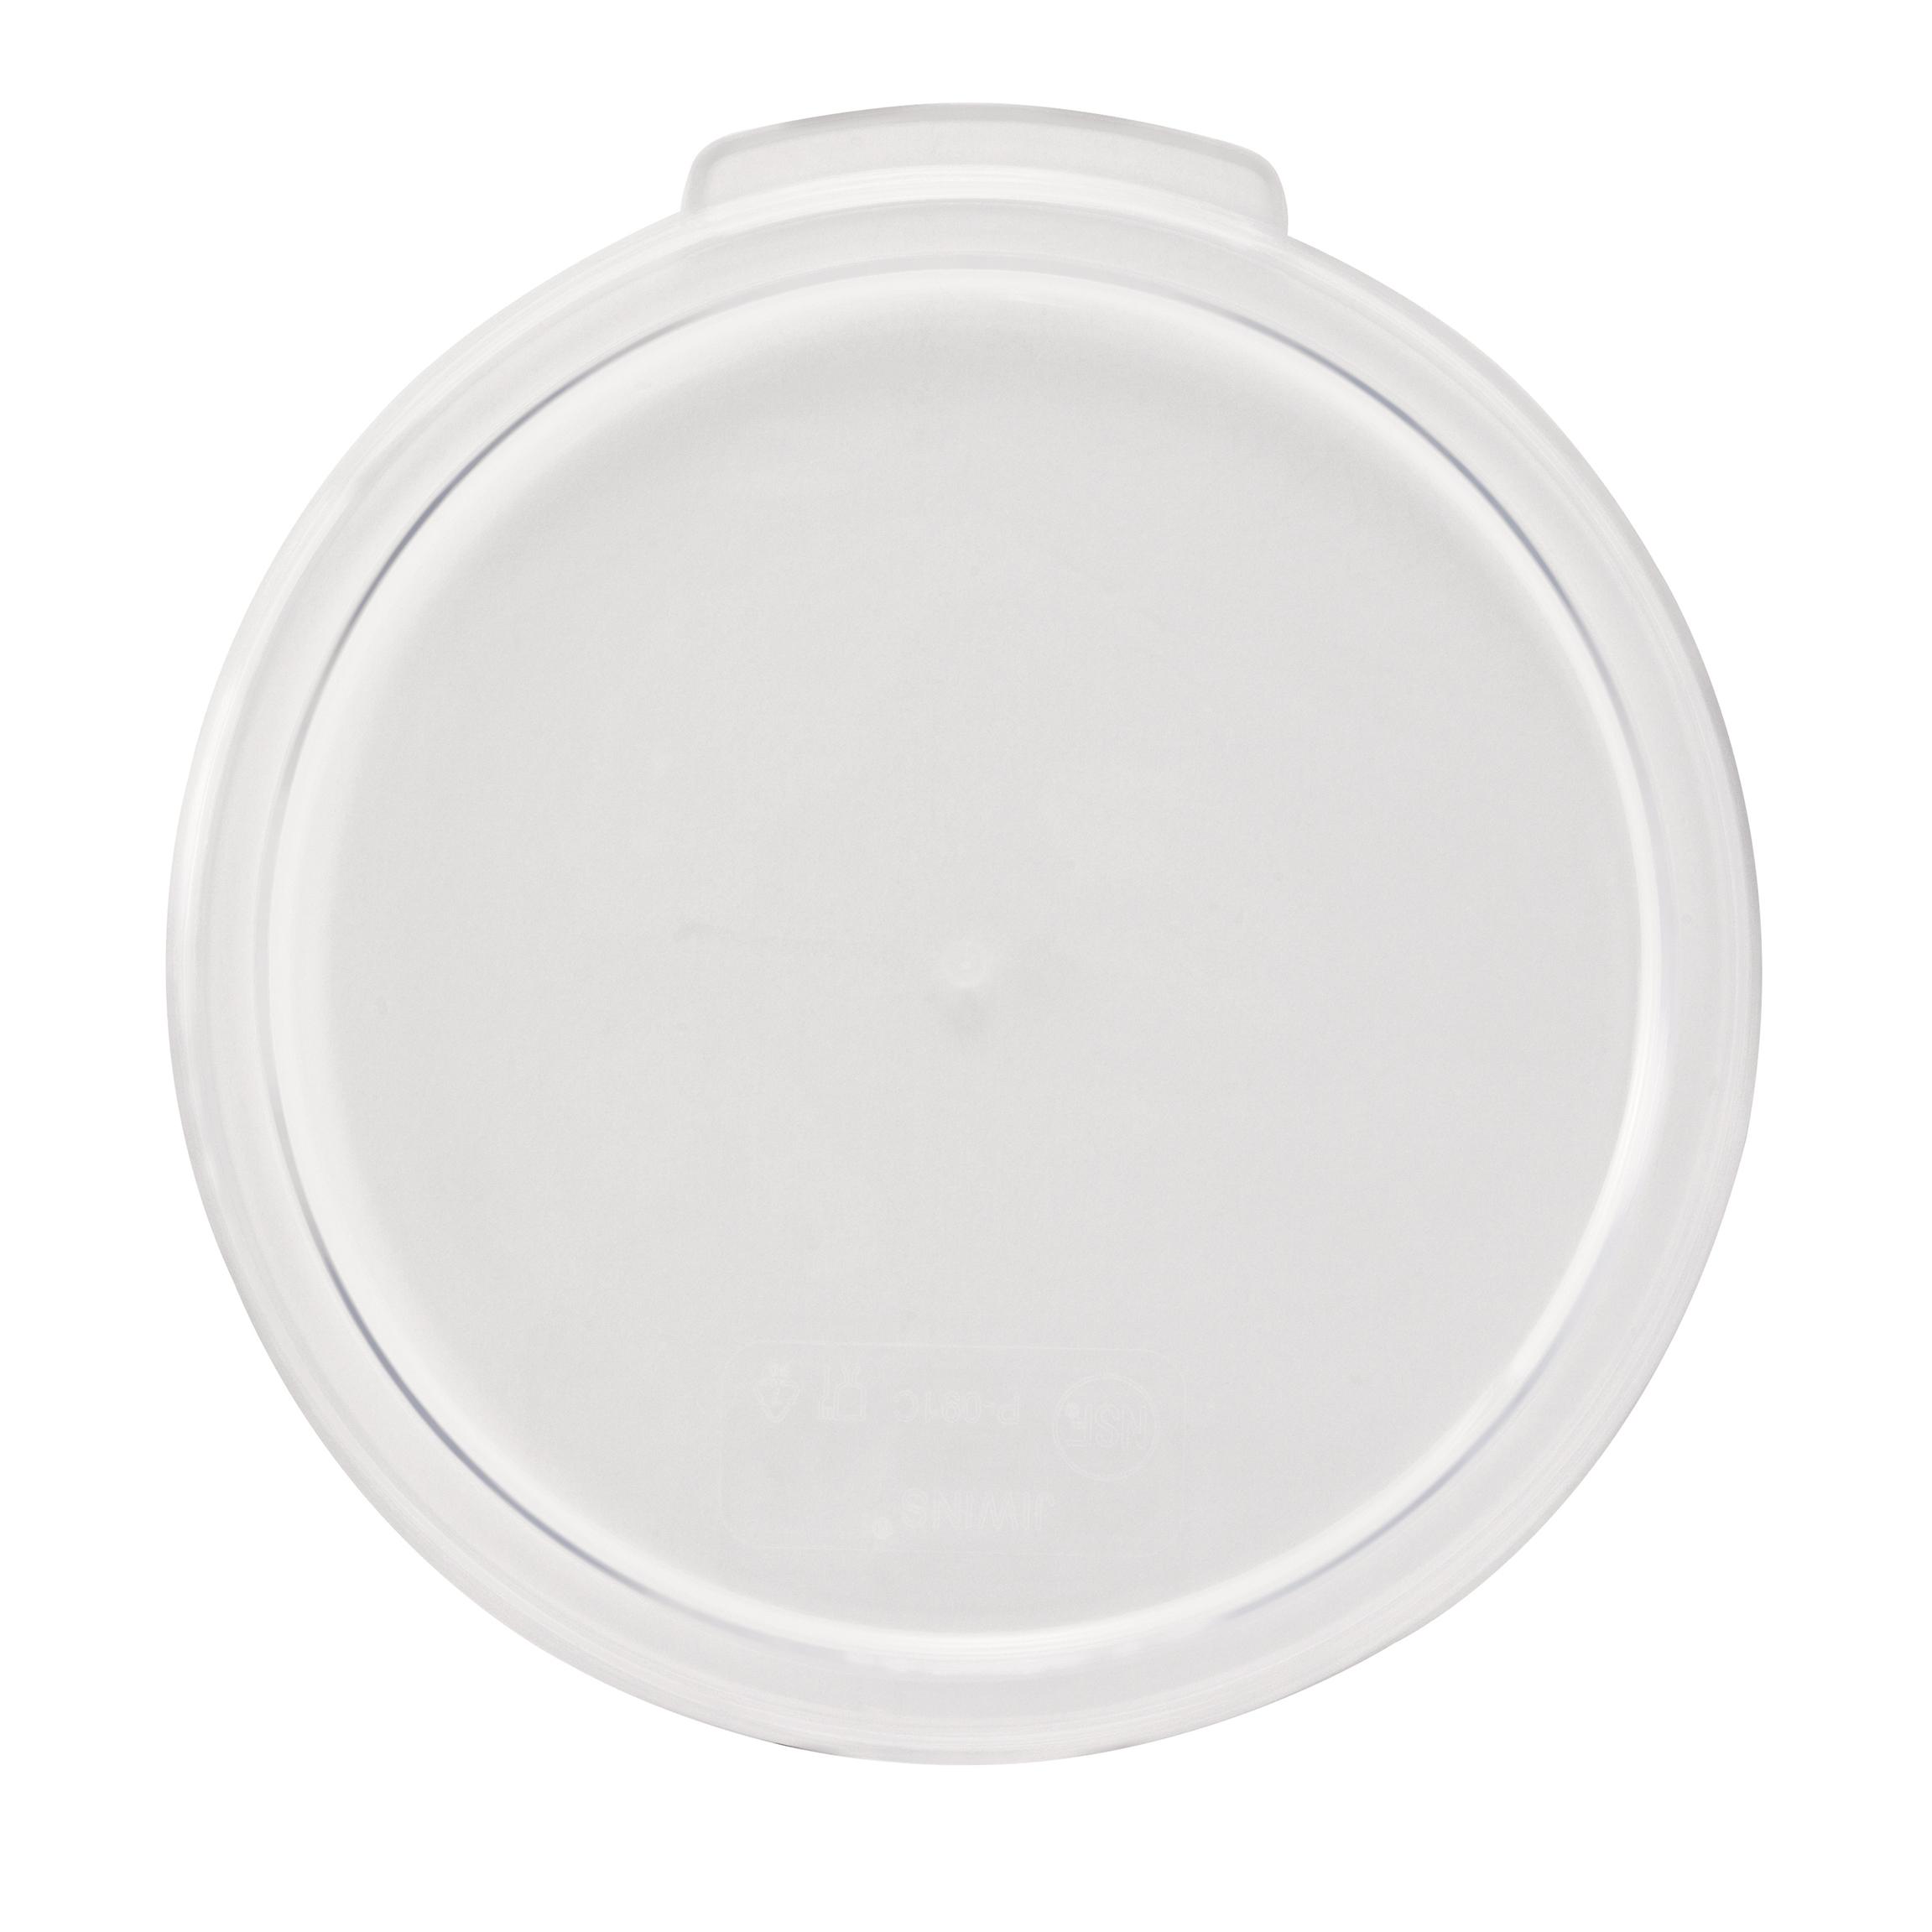 Winco PCRC-1222C food storage container cover